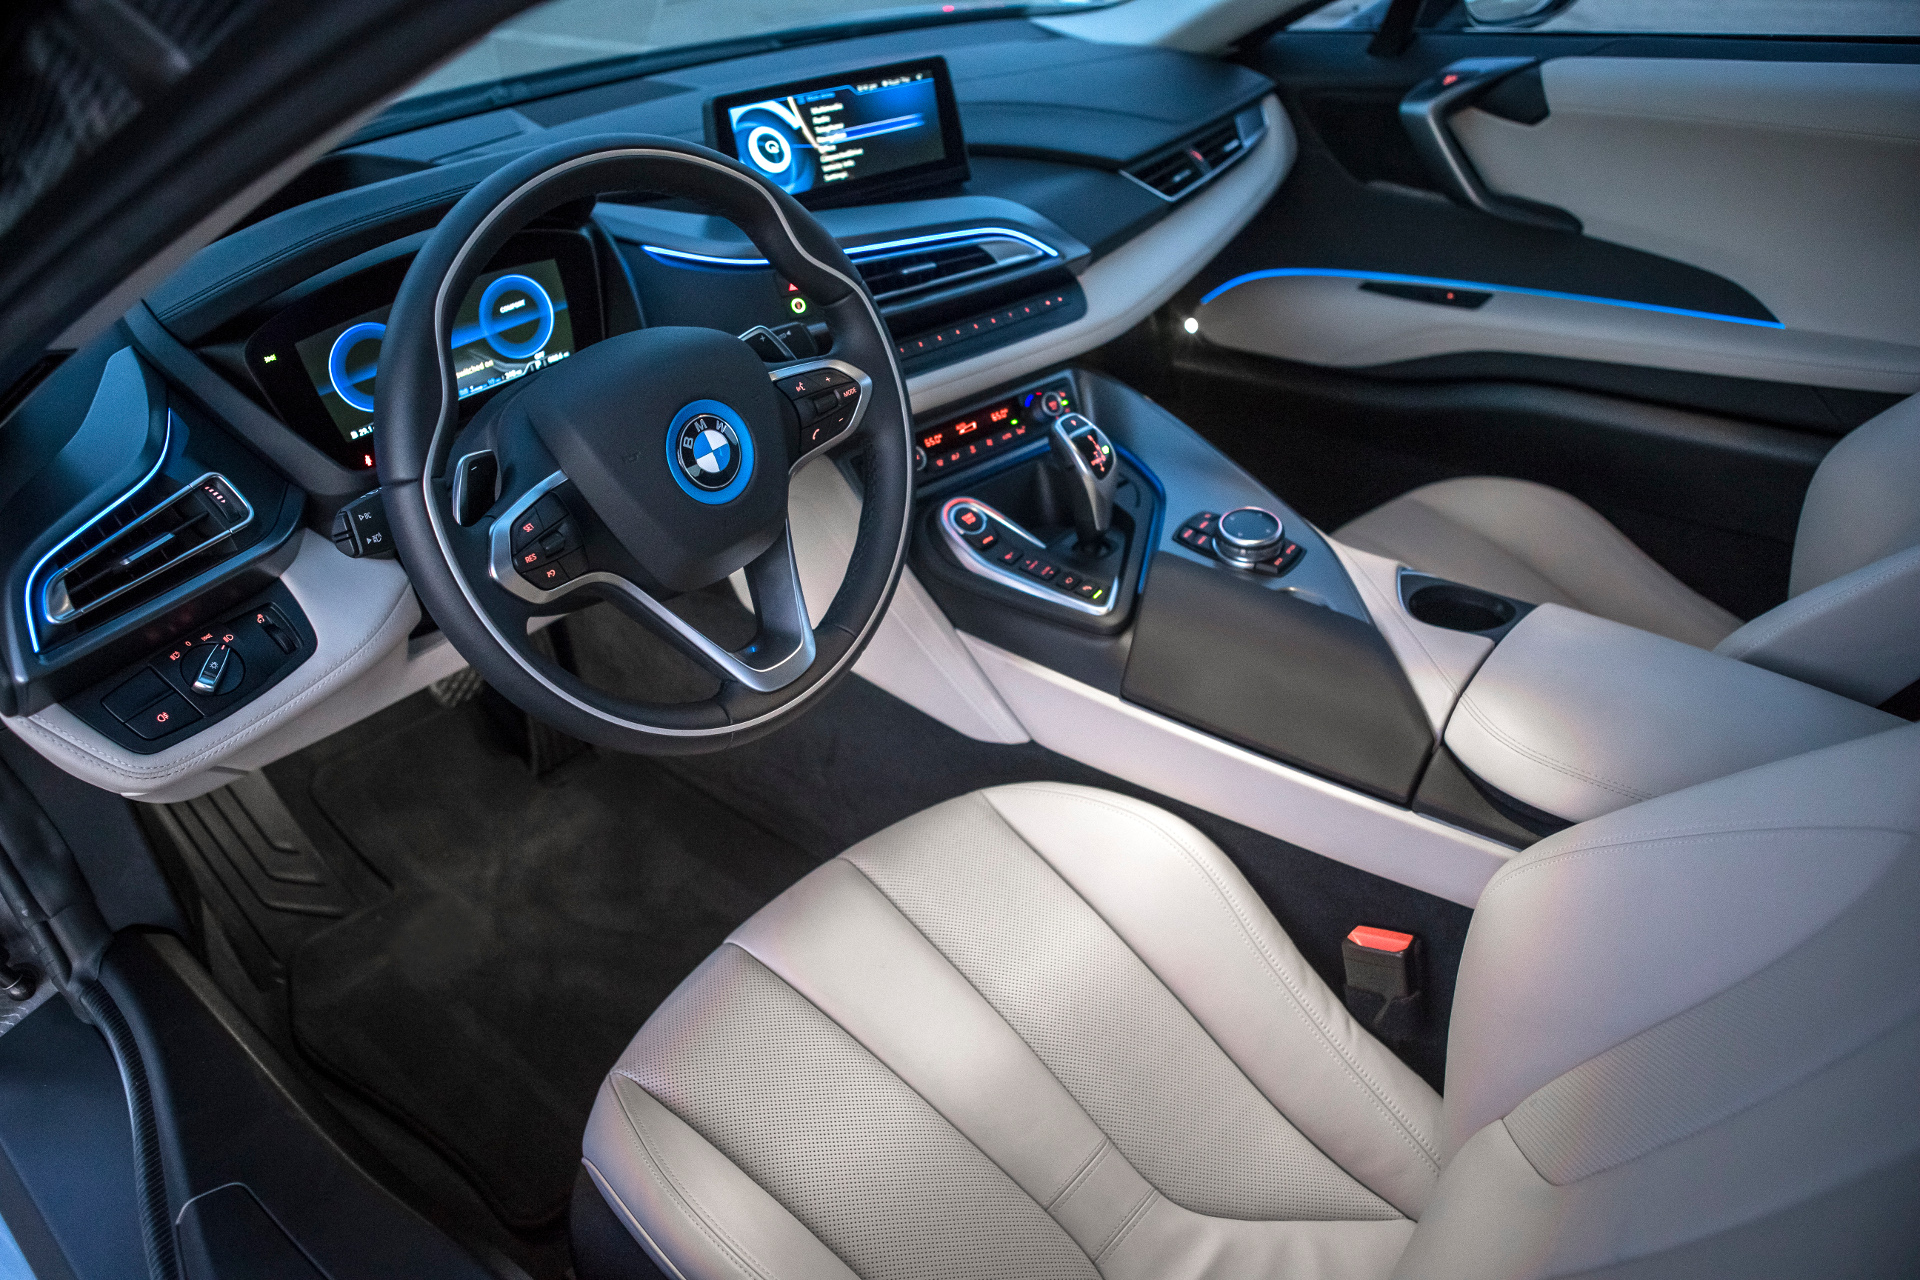 BMW i8 Concours d Elegance Edition 2014 Pebble Beach Frozen Grey 10